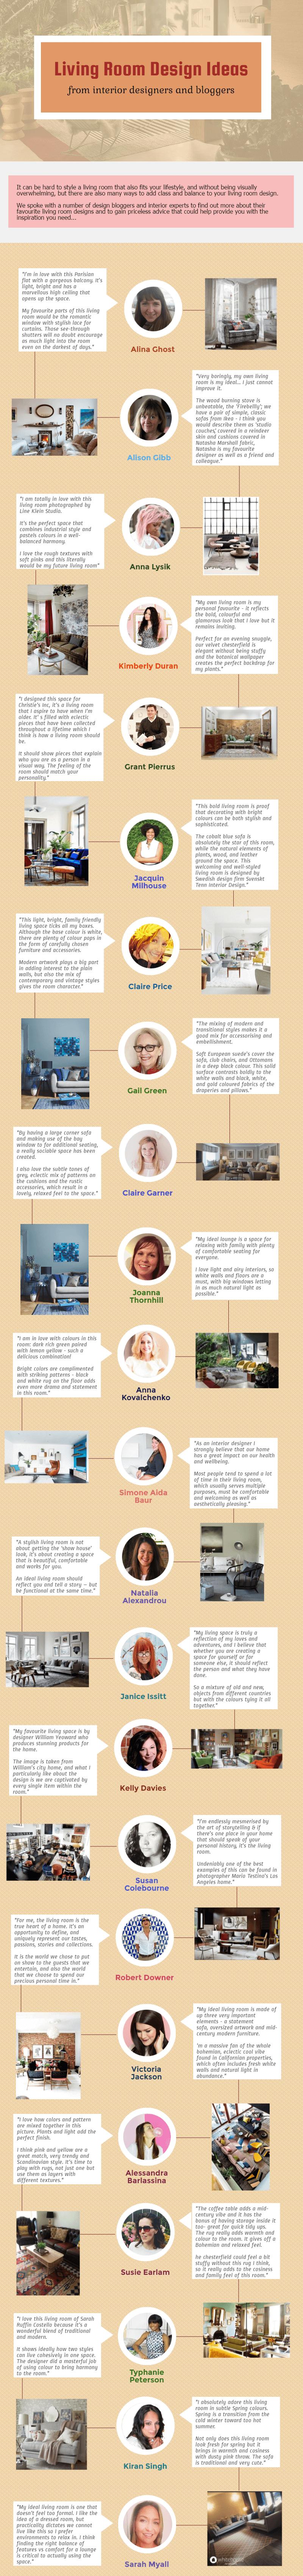 INTERIOR DESIGNERS & BLOGGERS ON LIVING ROOMS DESIGN IDEAS (INFOGRAPHIC)